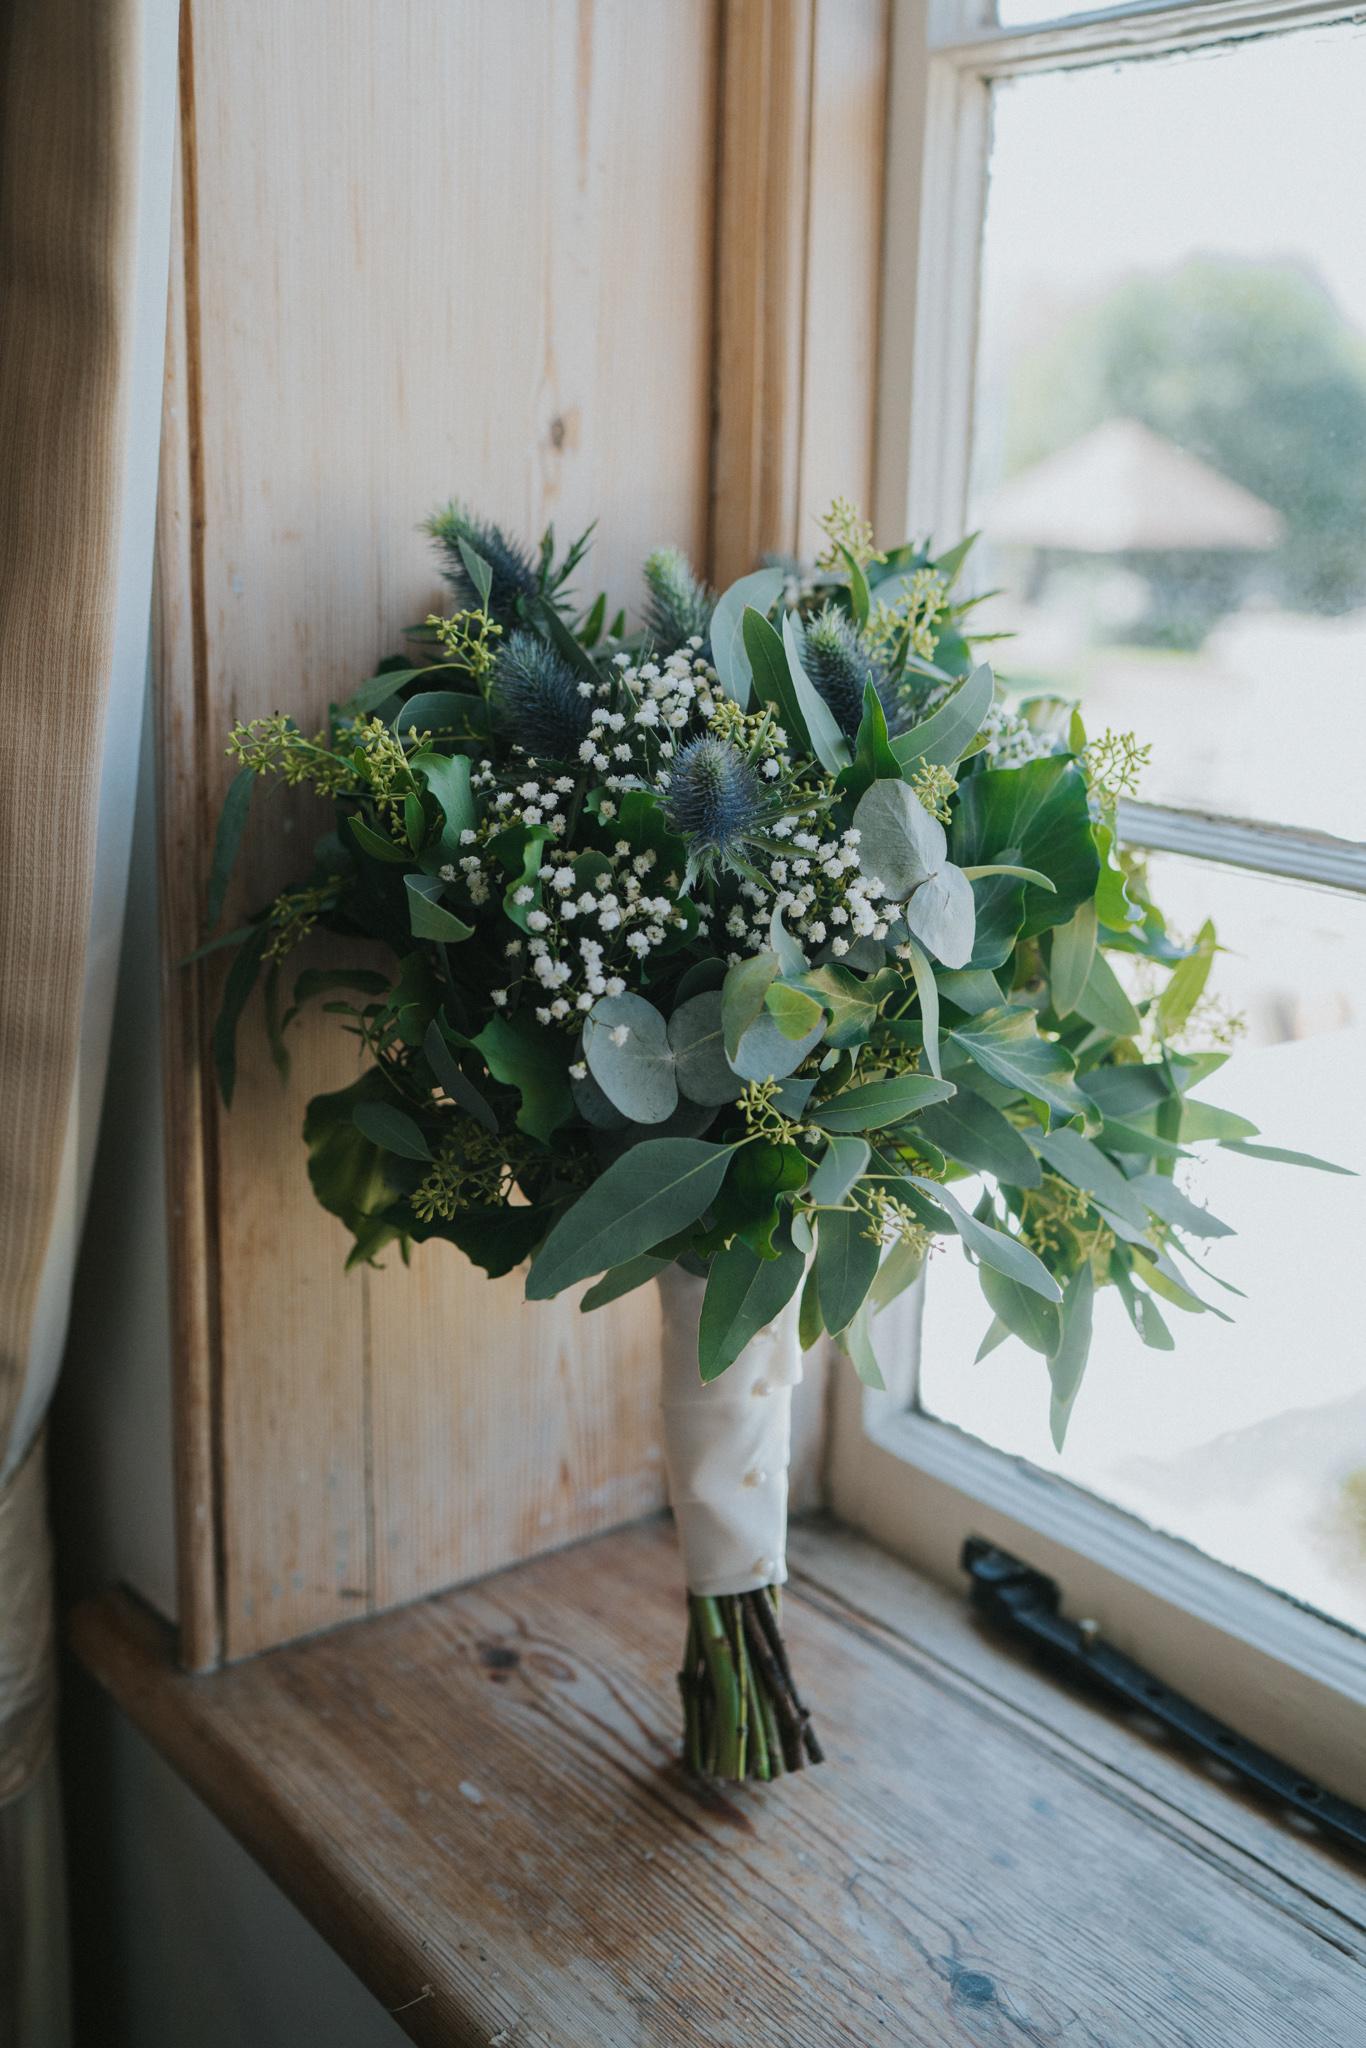 Sophie-Christian-Prested-Hall-Grace-Elizabeth-Previews-Essex-Norfolk-Suffolk-Devon-Alternative-Wedding-Photographer (1 of 1)-2.jpg